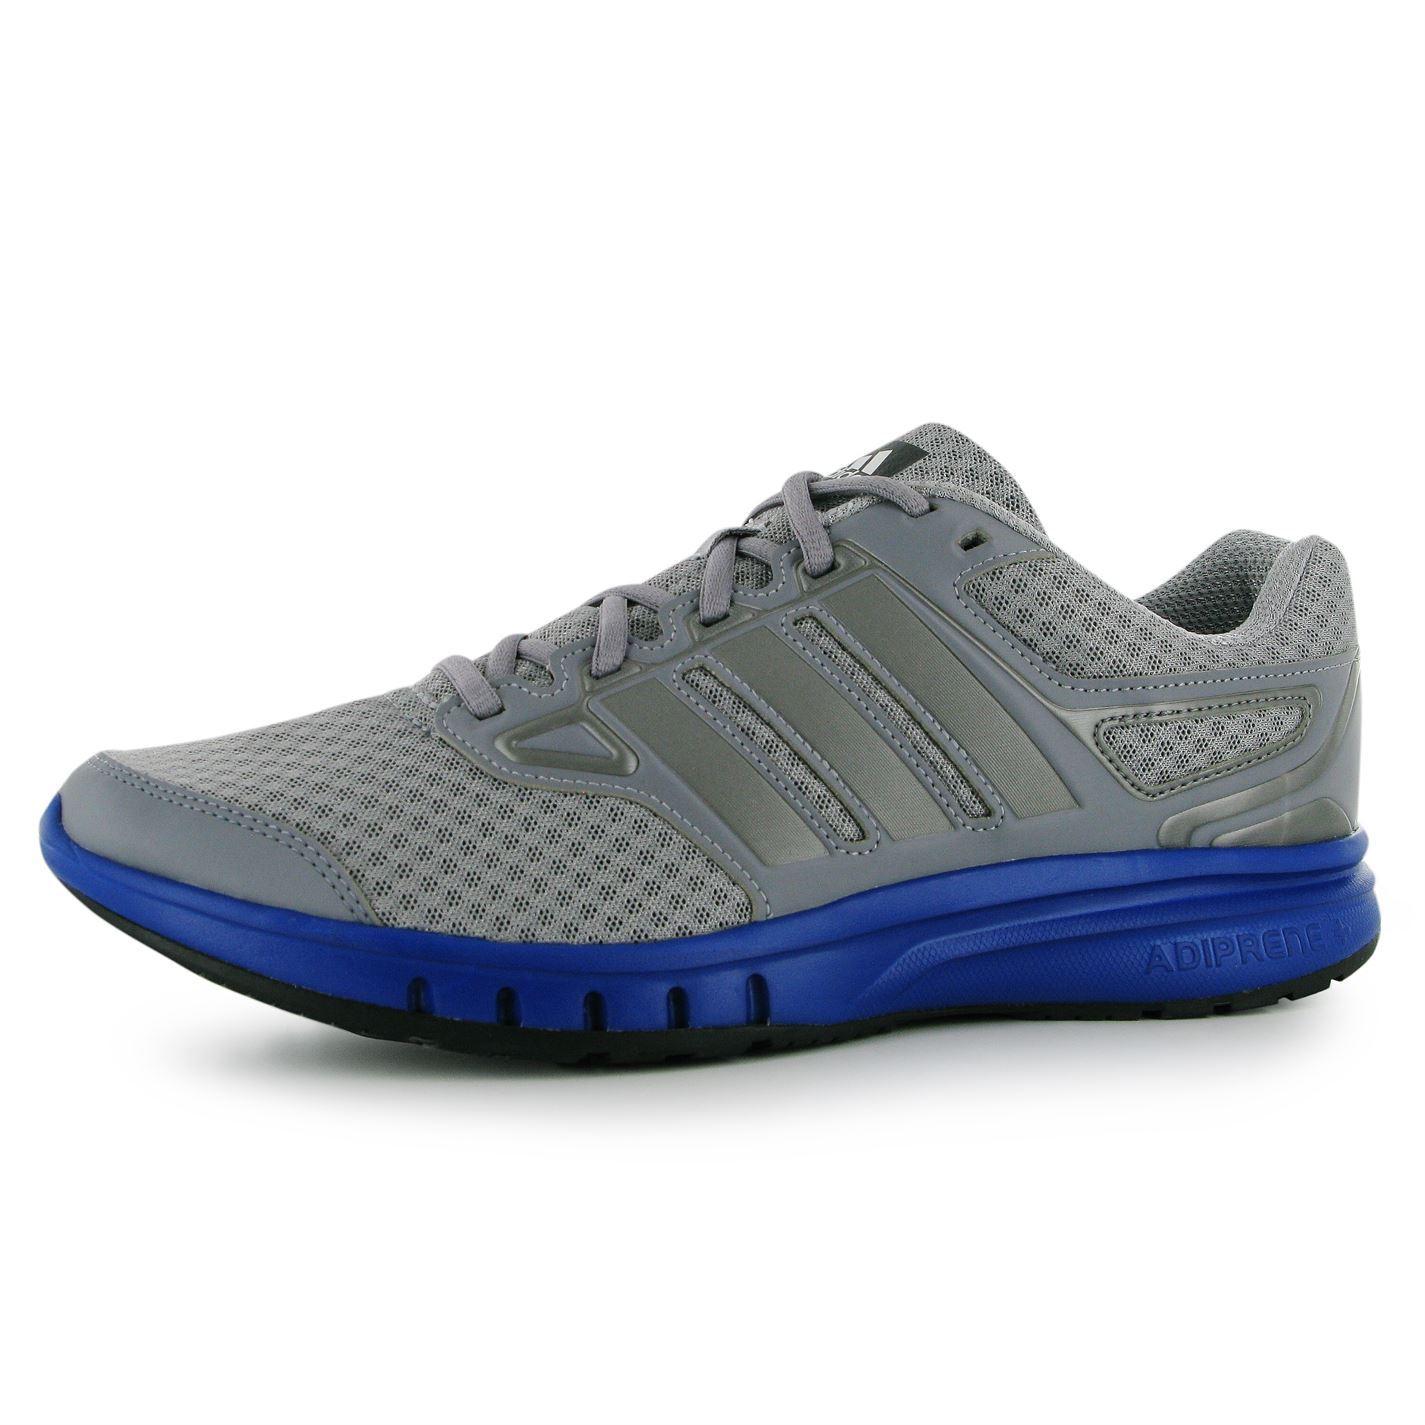 Adidas Galaxy Elite  Mens Running Shoes